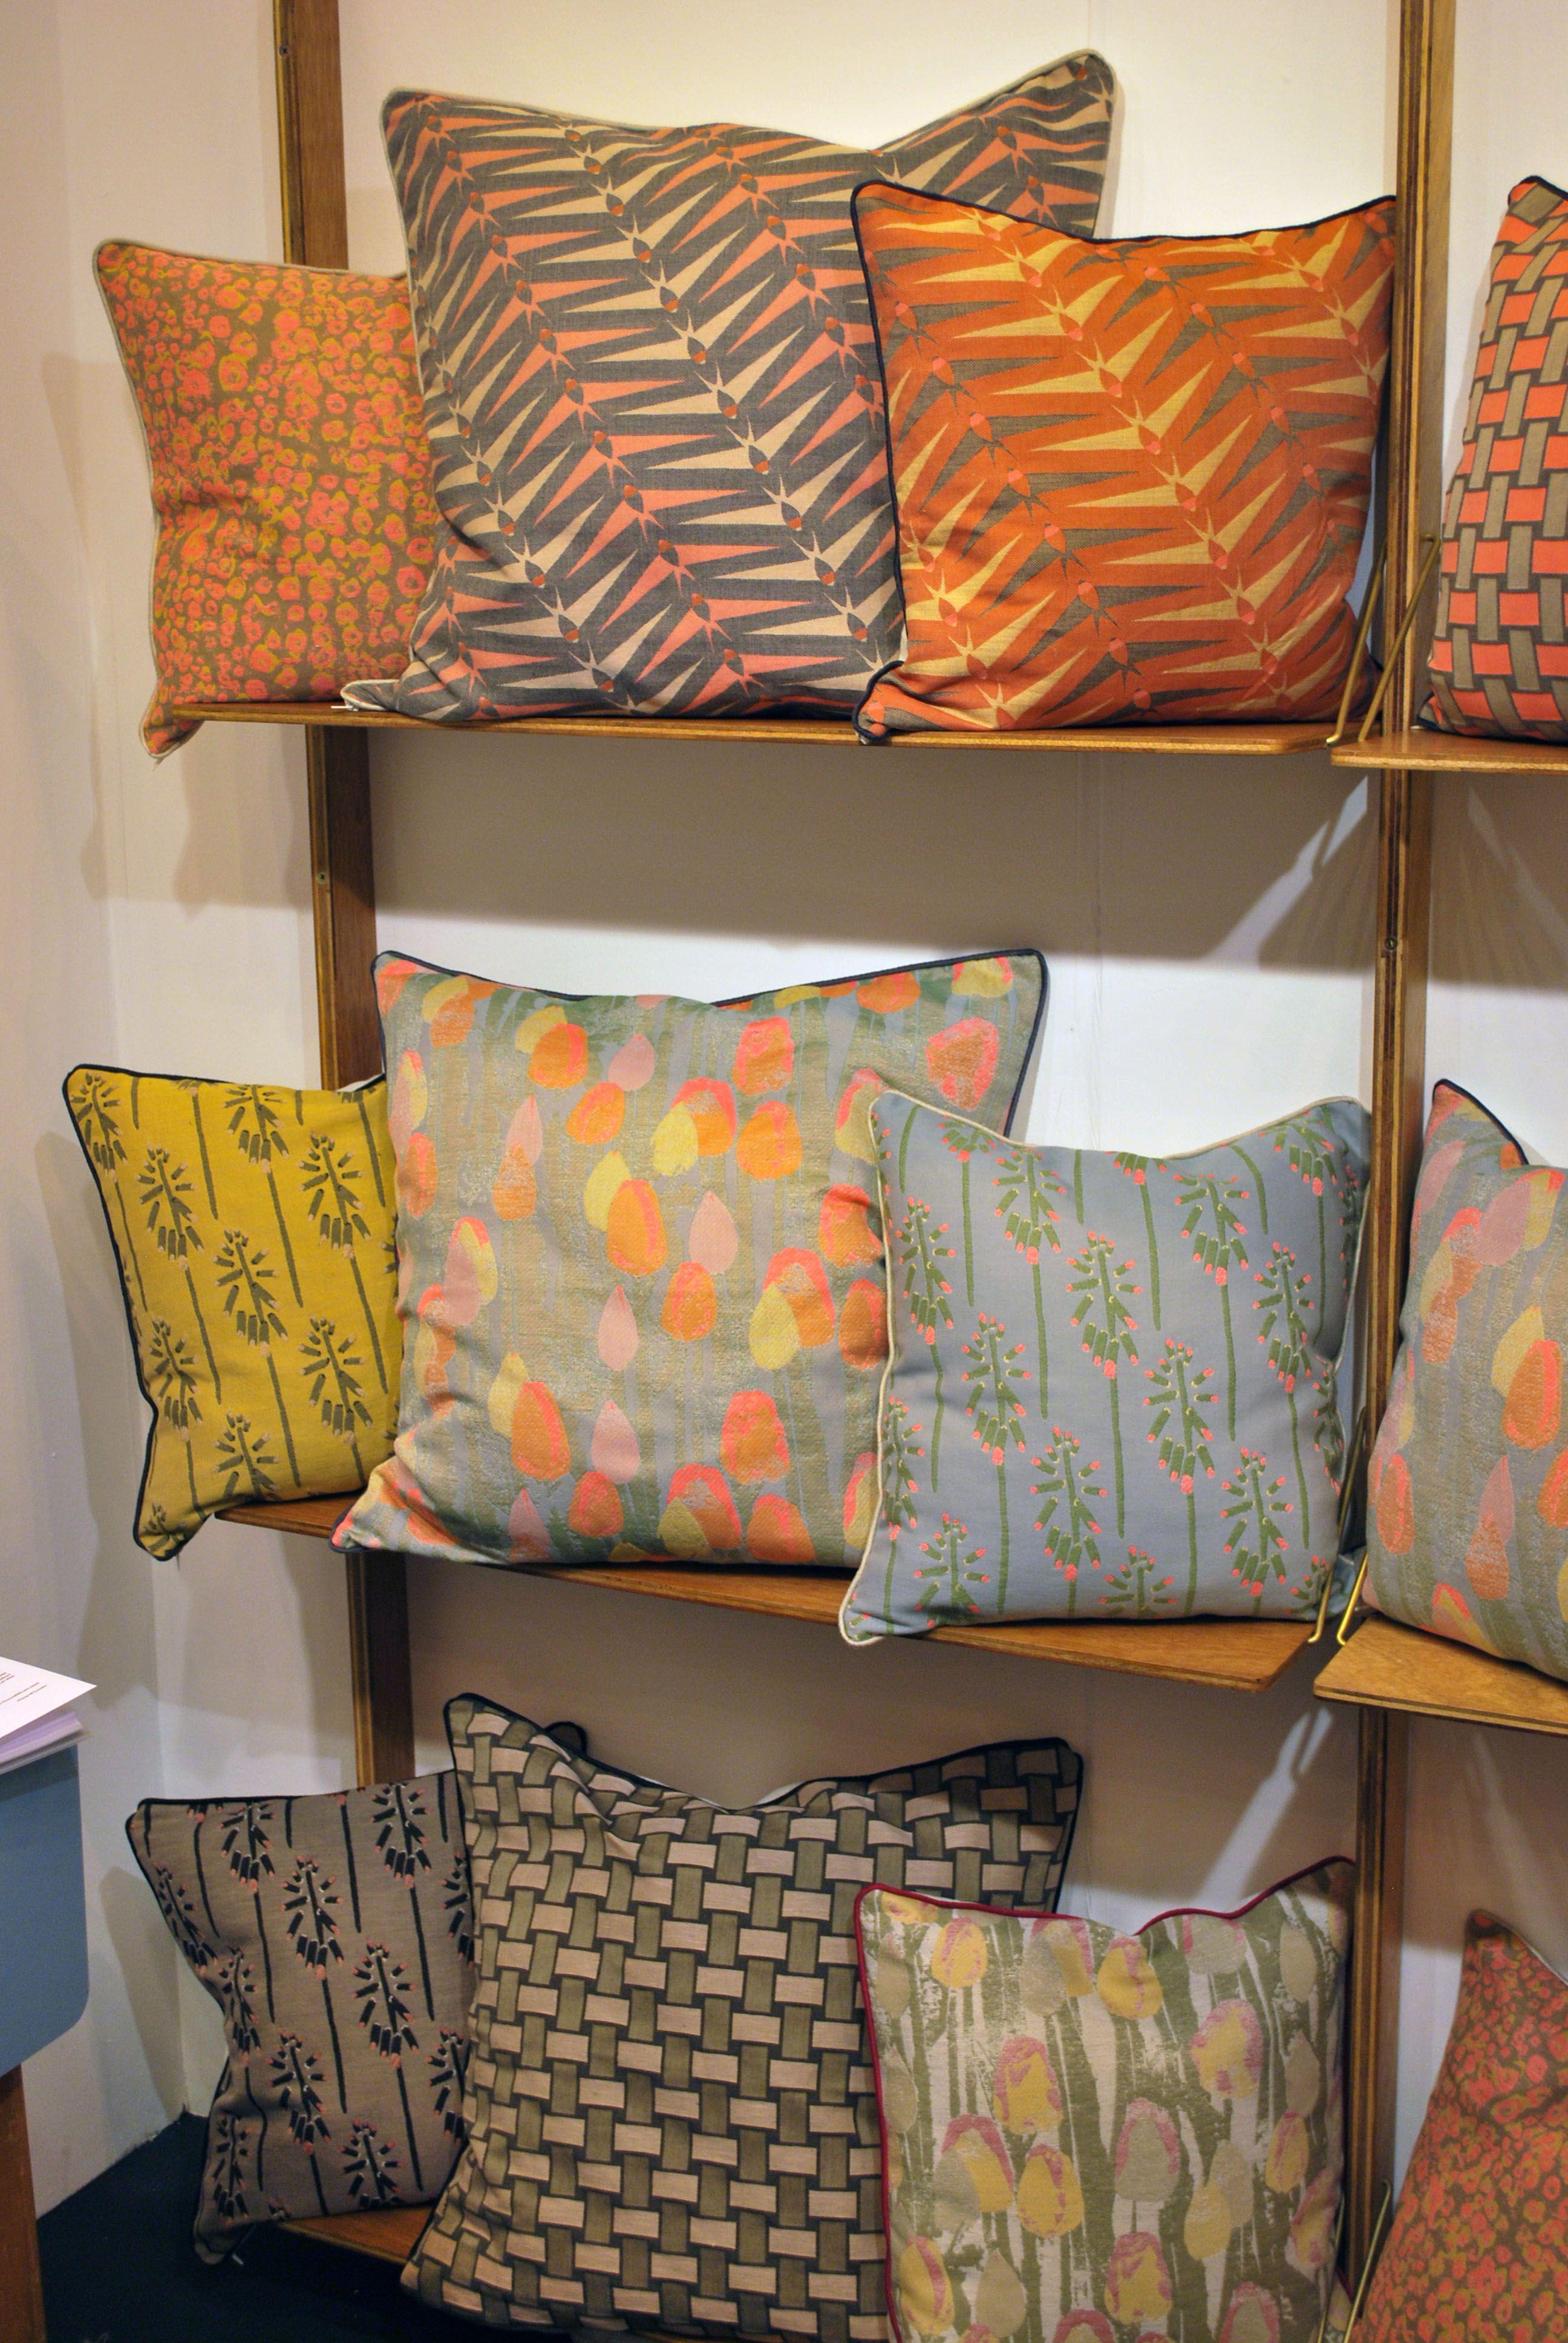 Pin by Helen PentonVoak on home Home, Print patterns